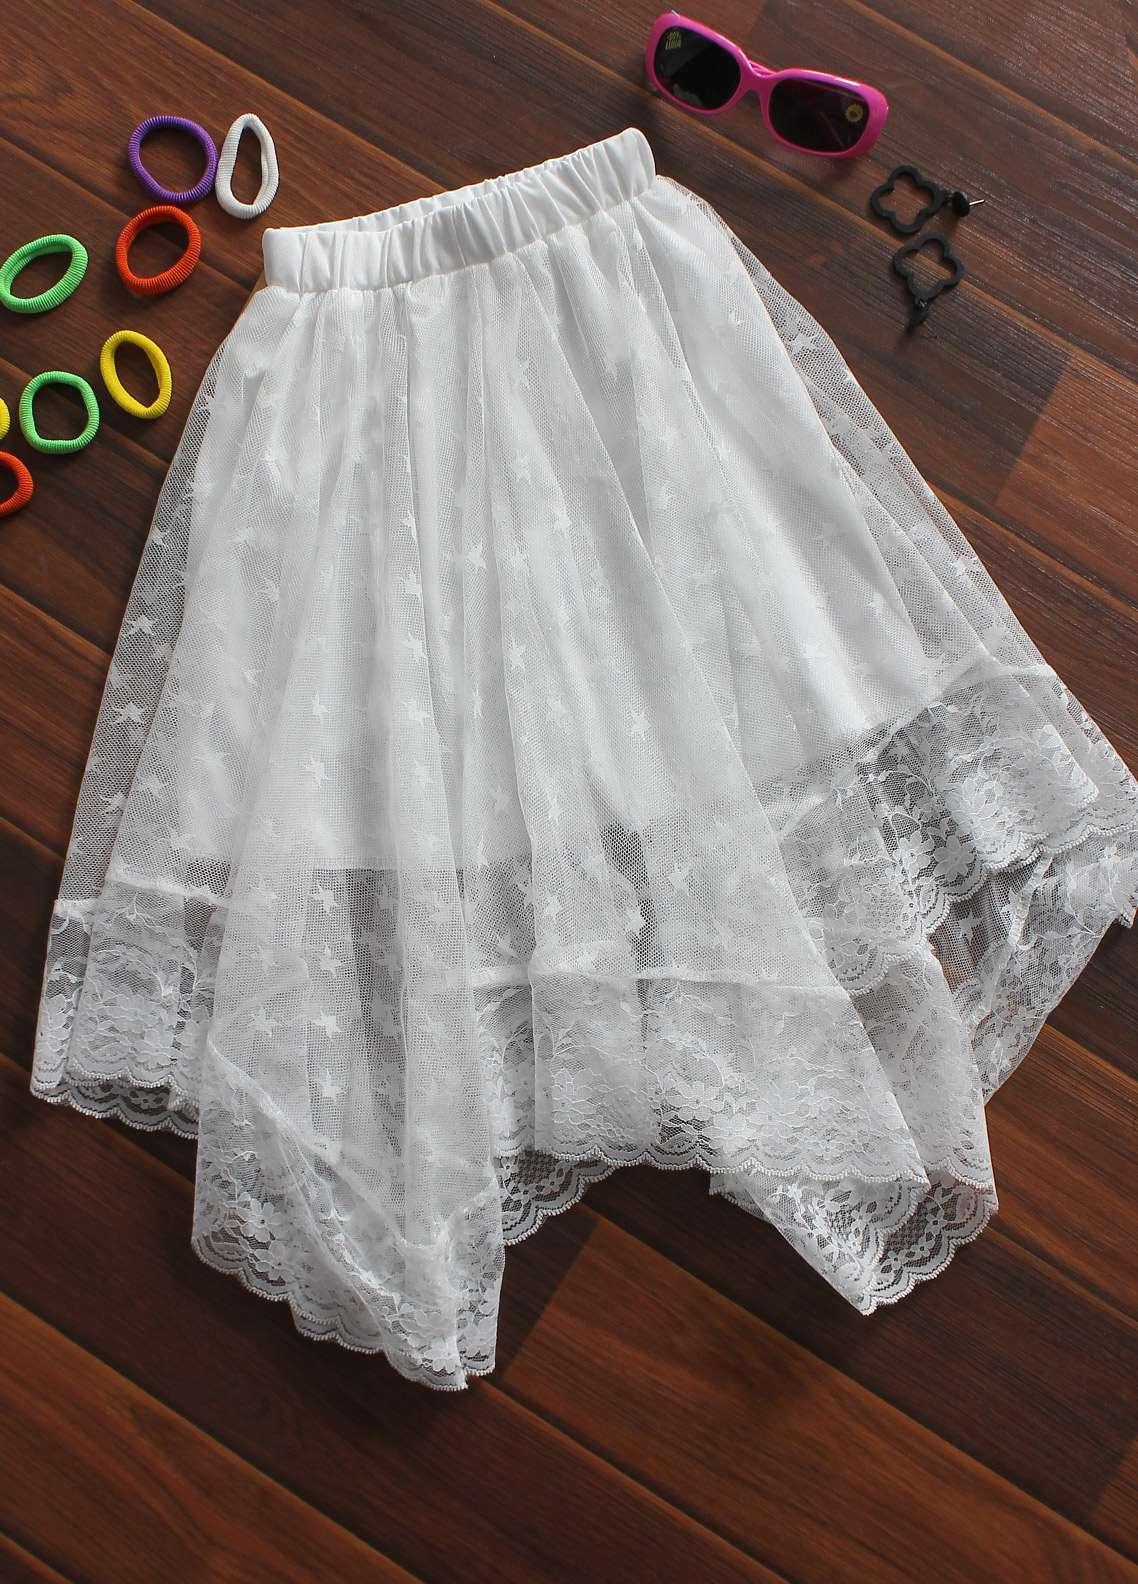 Sanaulla Exclusive Range Cotton Net Fancy Skirts for Girls -  845 White